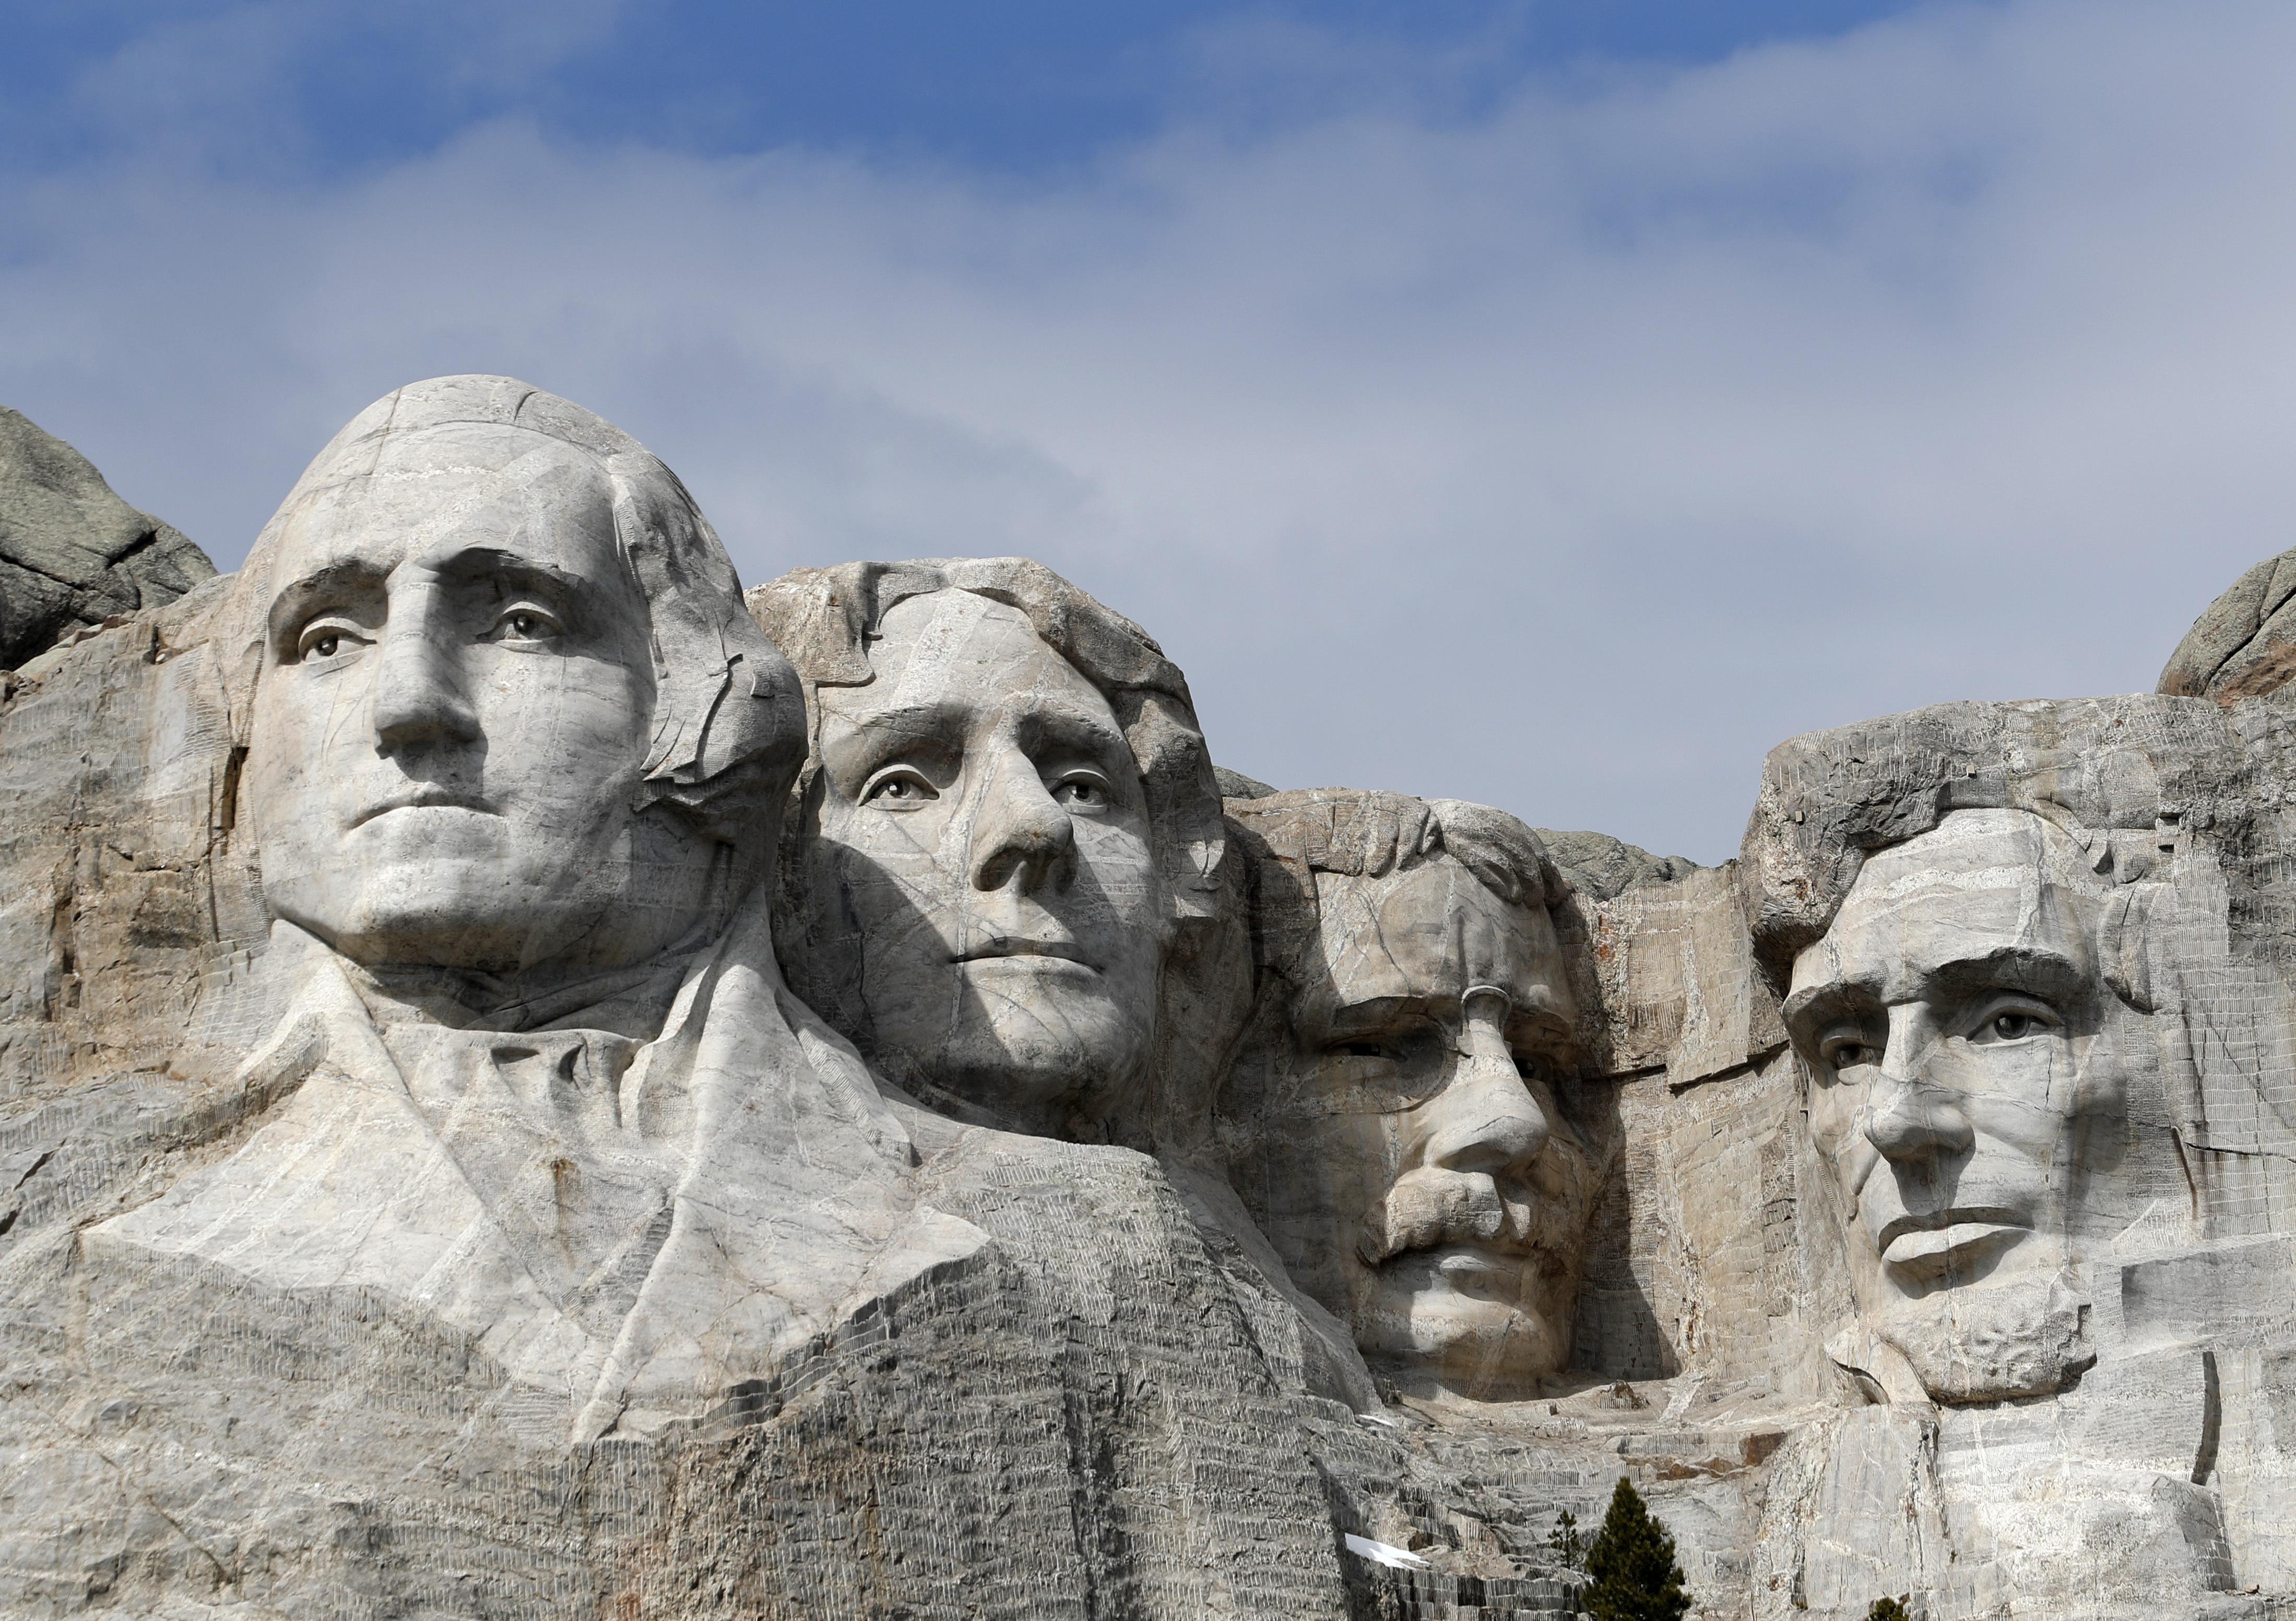 Trump Statue Protests Threaten U S Values